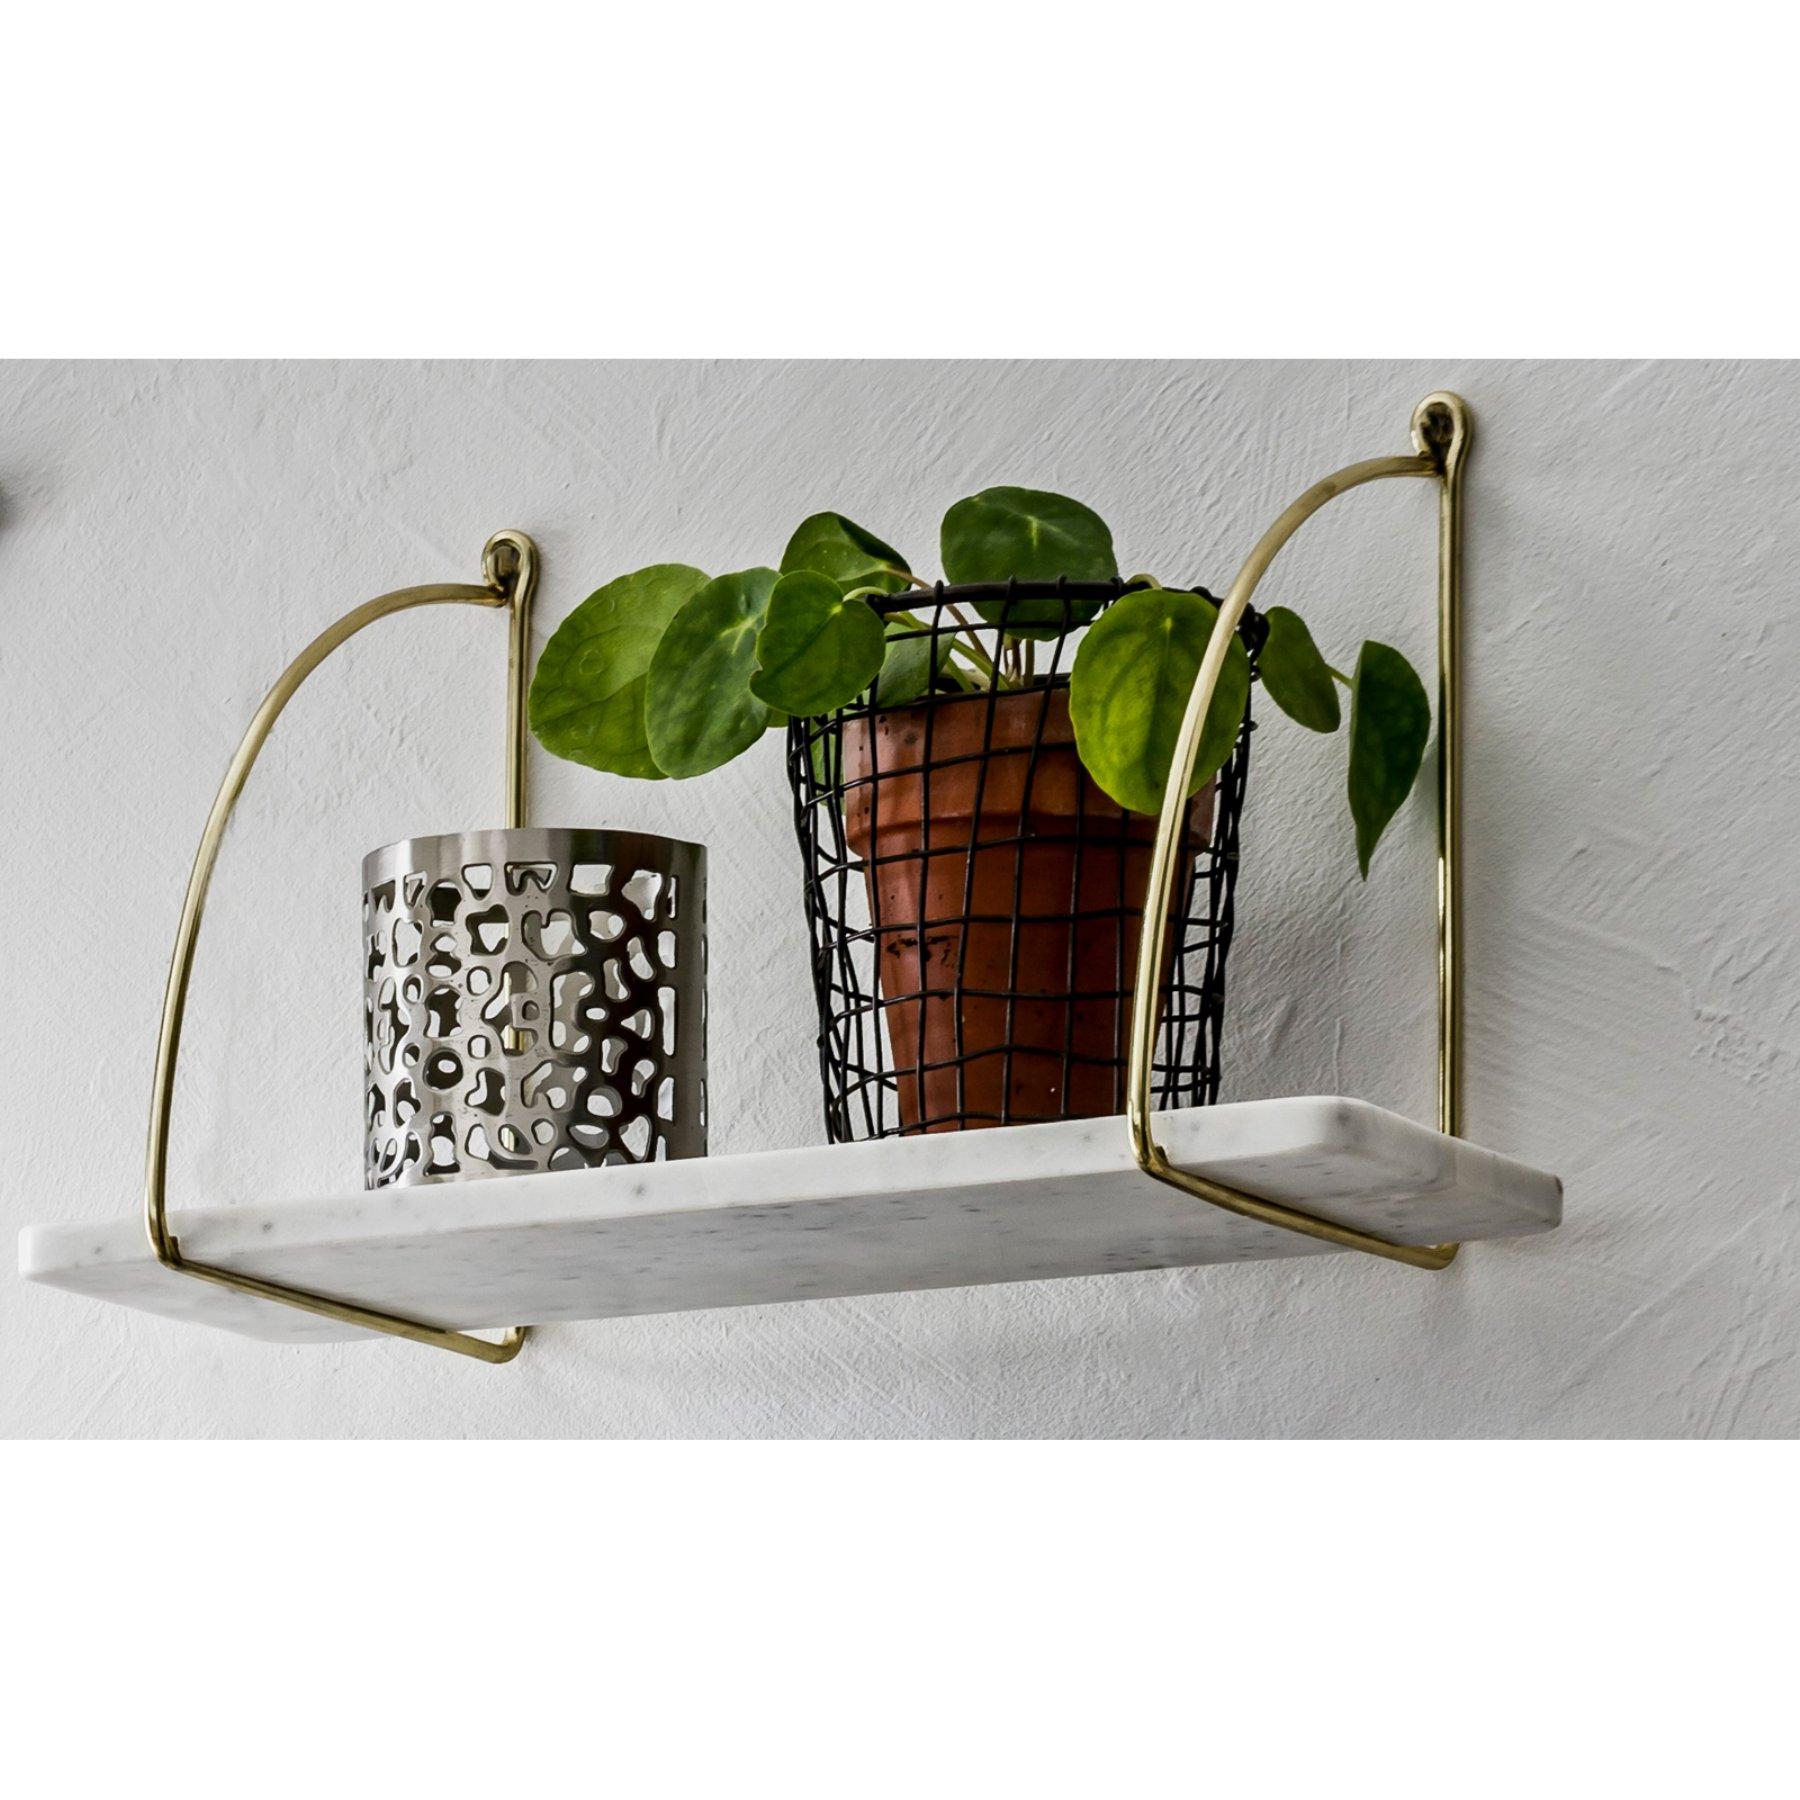 Eightmood Porter Decorative Shelf  94024981880